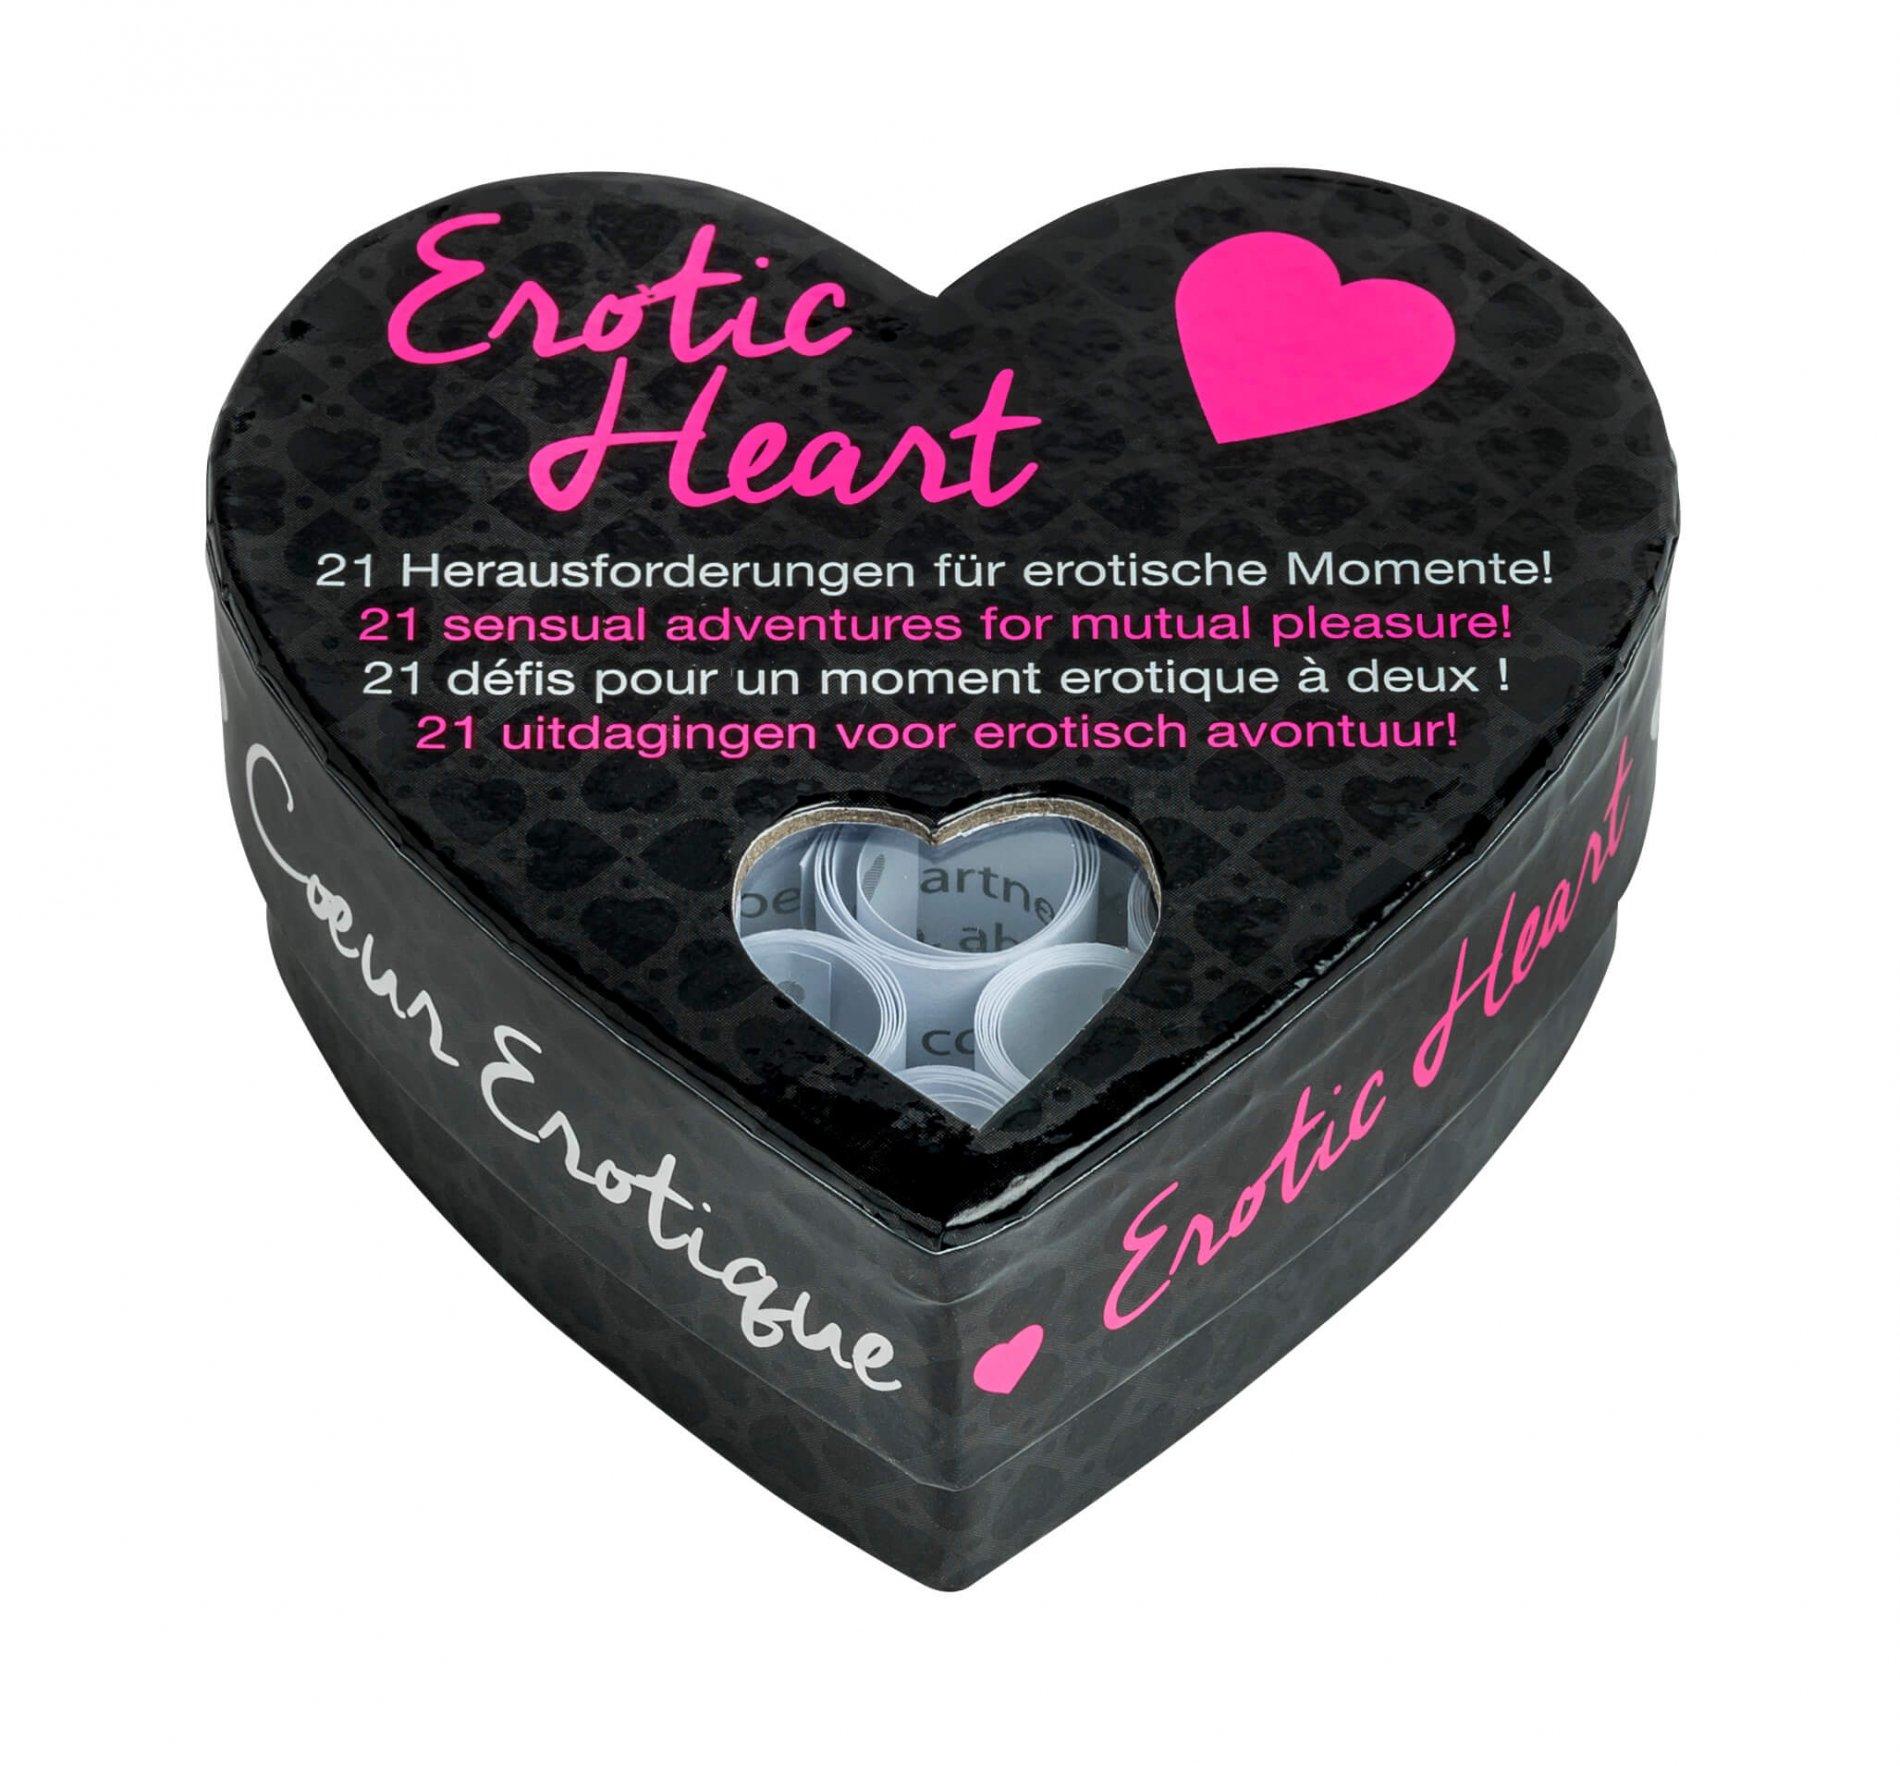 Tease & please Erotic heart